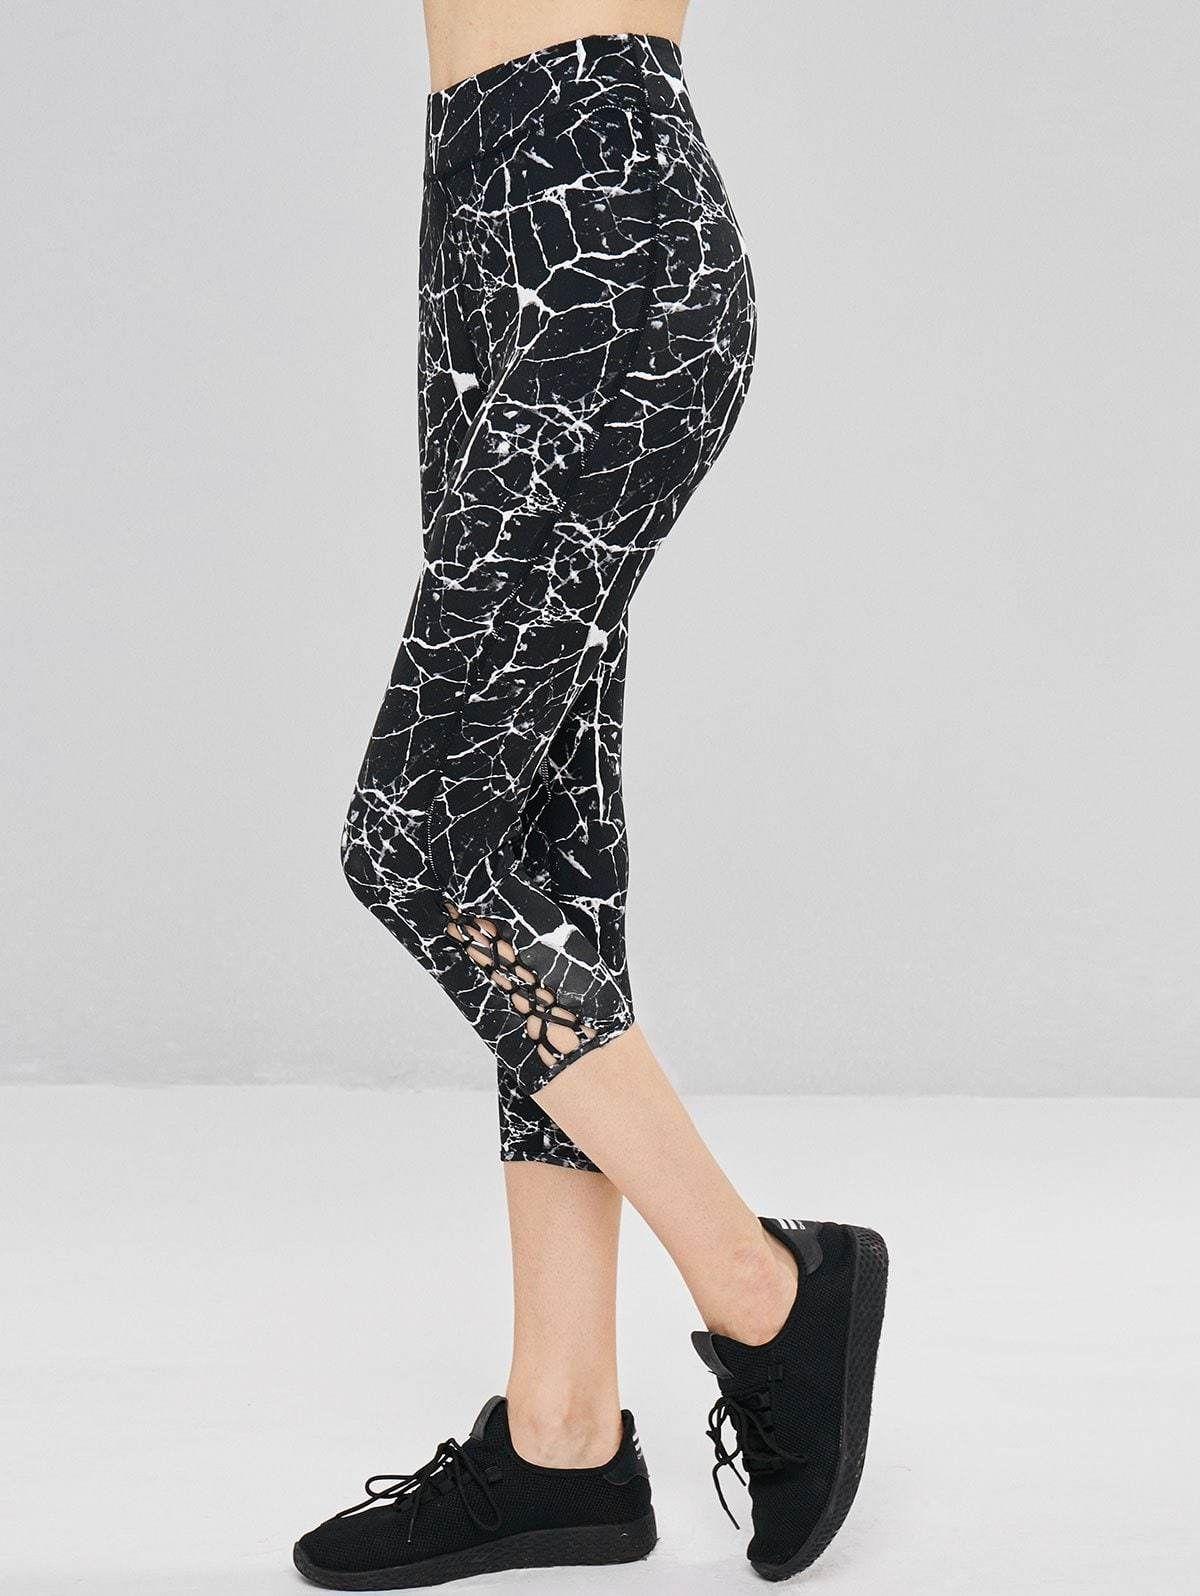 4ad8f780e7f01 Marble Print Criss Cross Sports Leggings – STEPEASY NET | Activewear ...